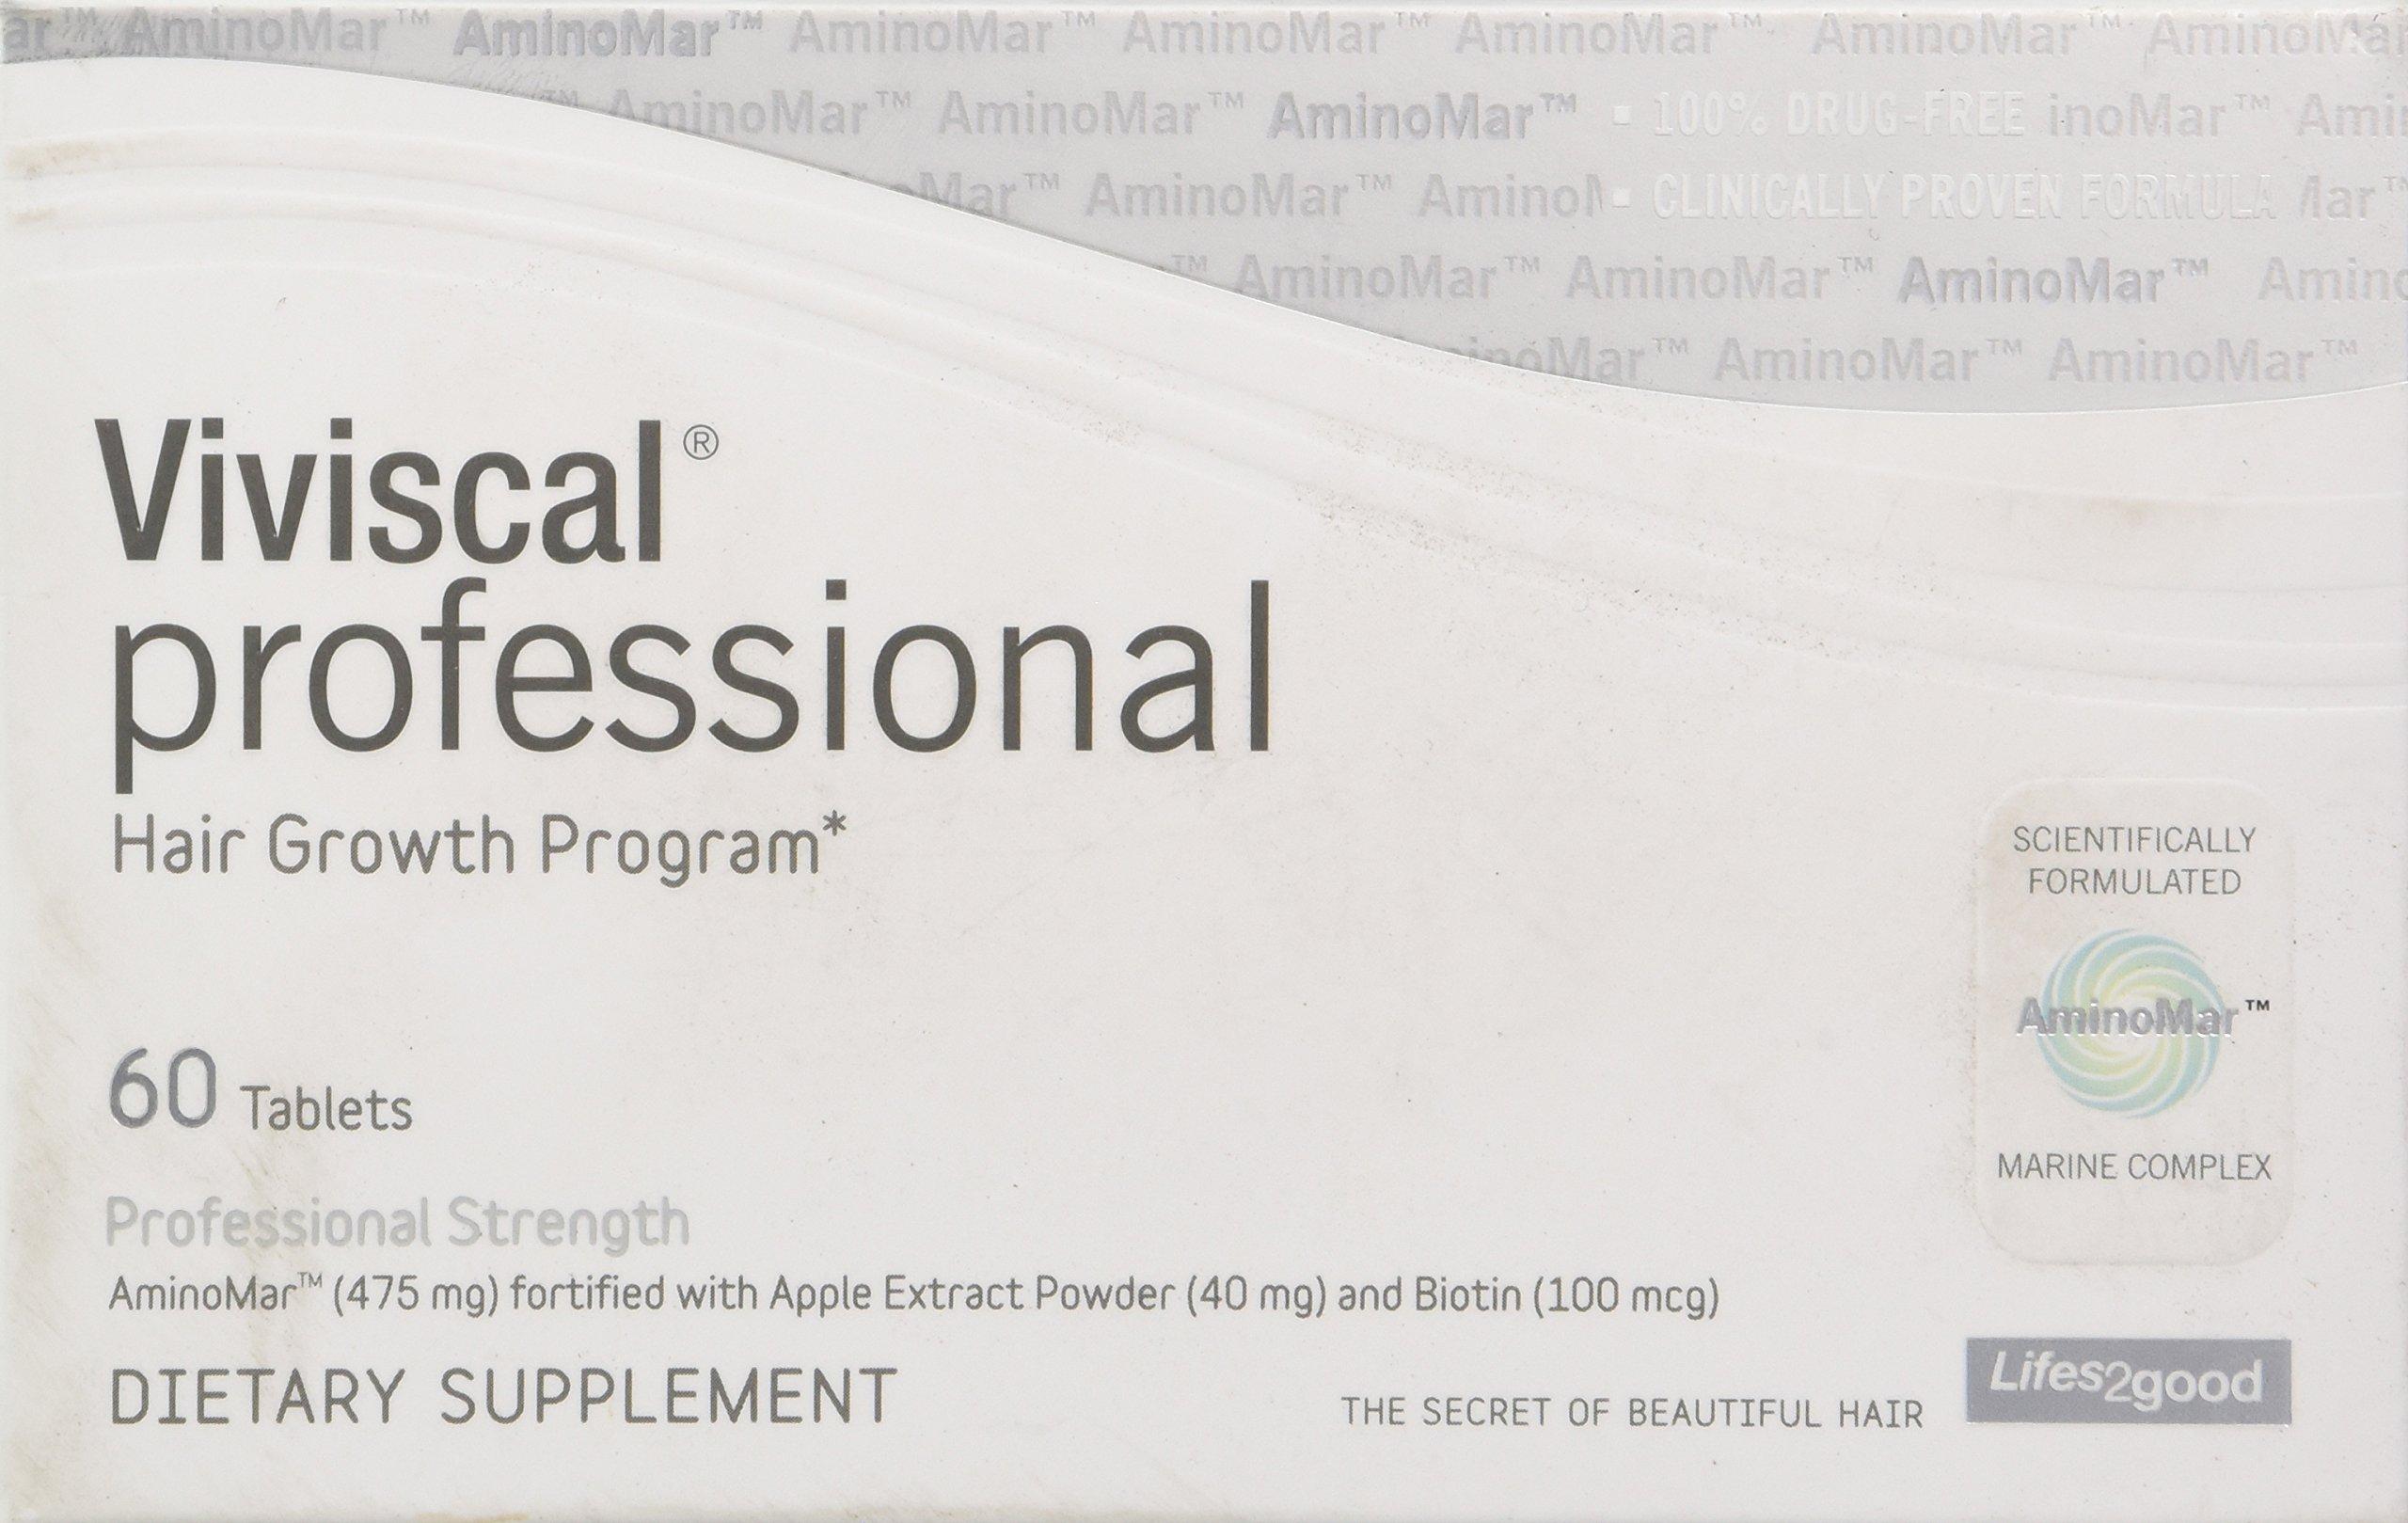 Viviscal Professional 60 Count